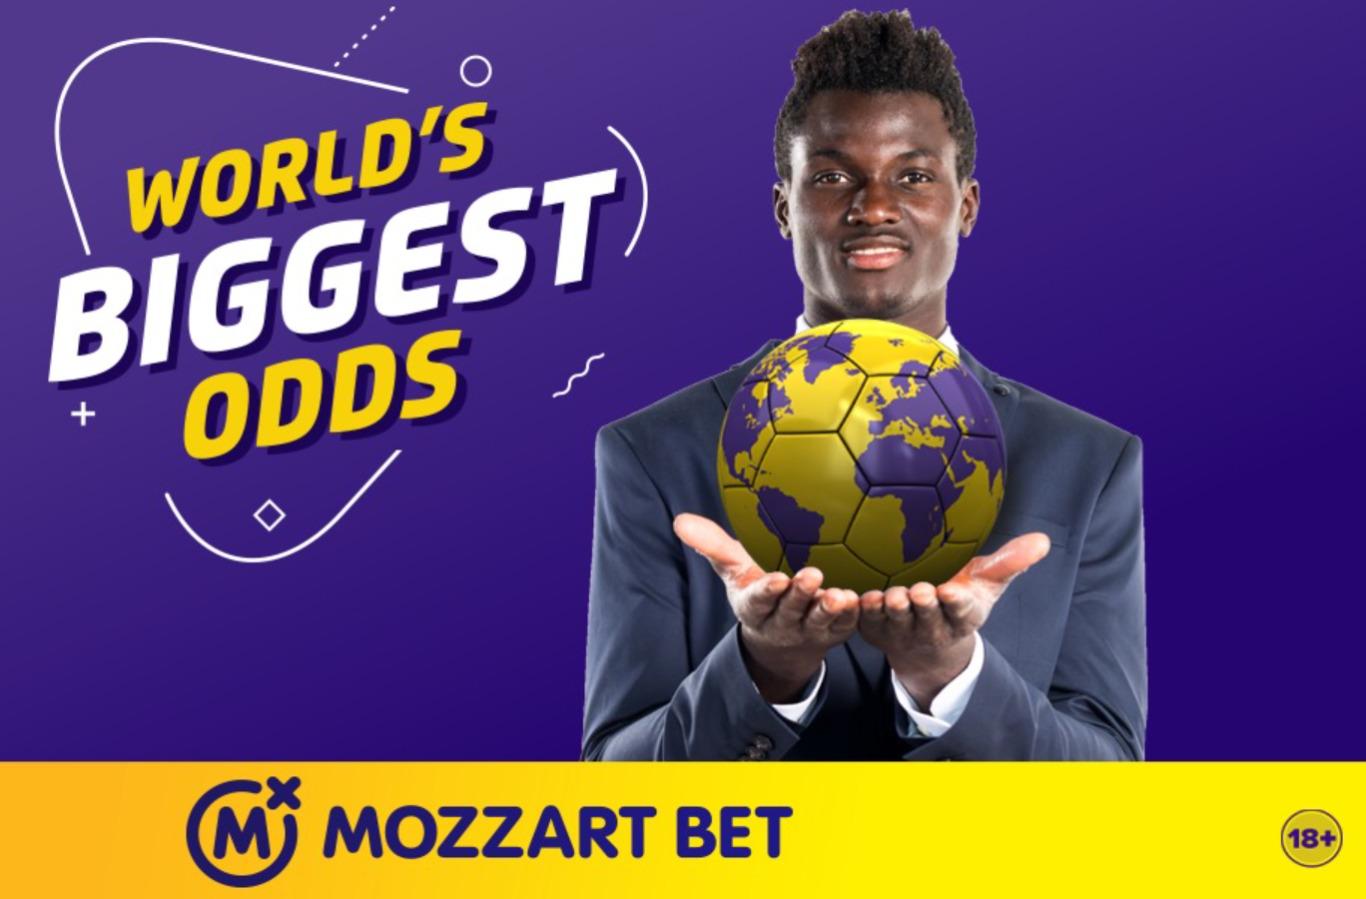 Mozzartbet biggest odds